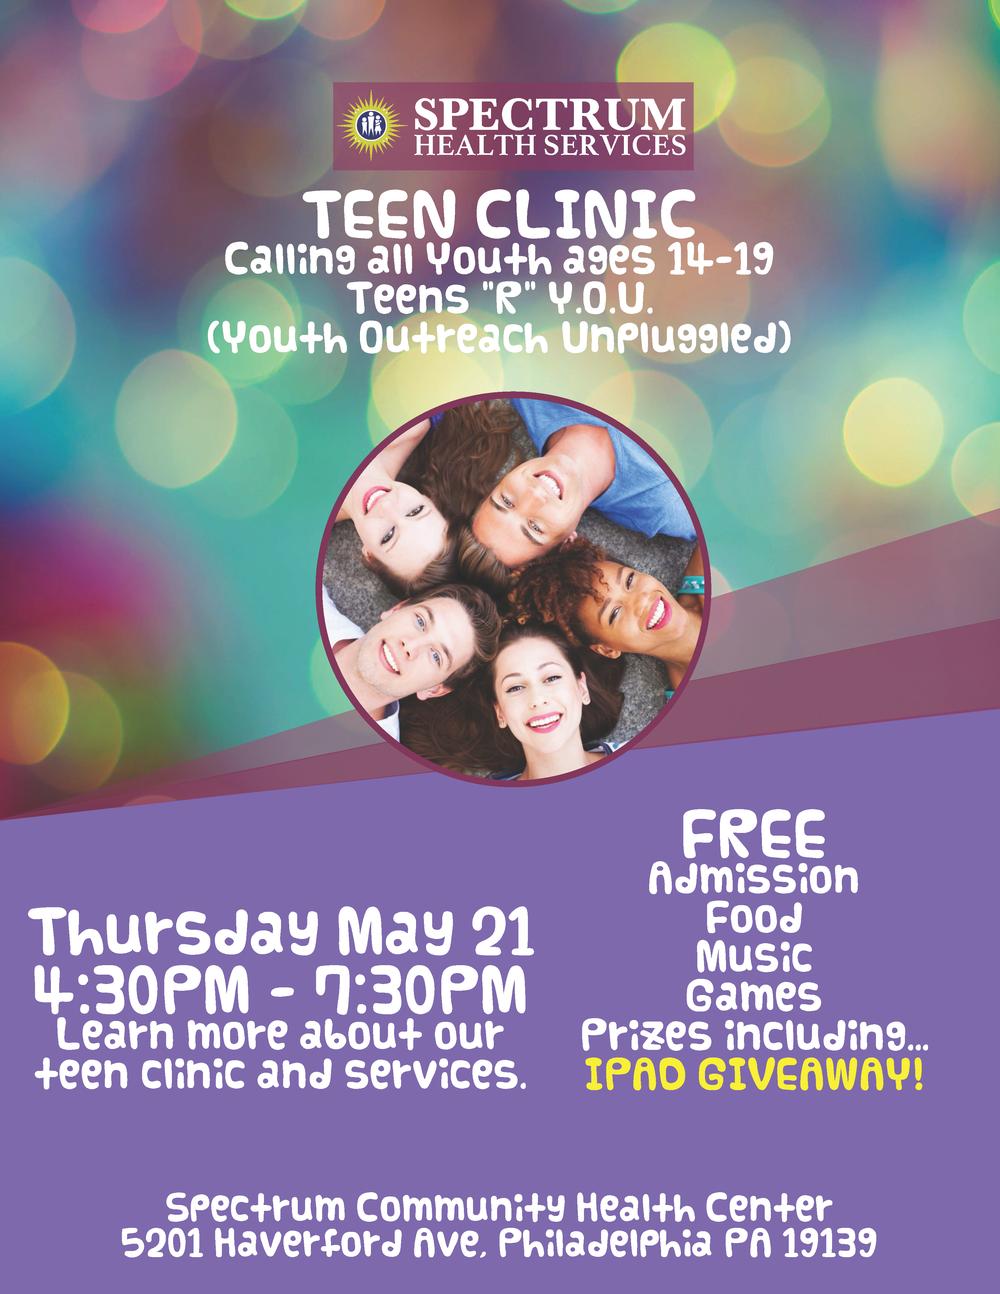 TeenClinic.jpg